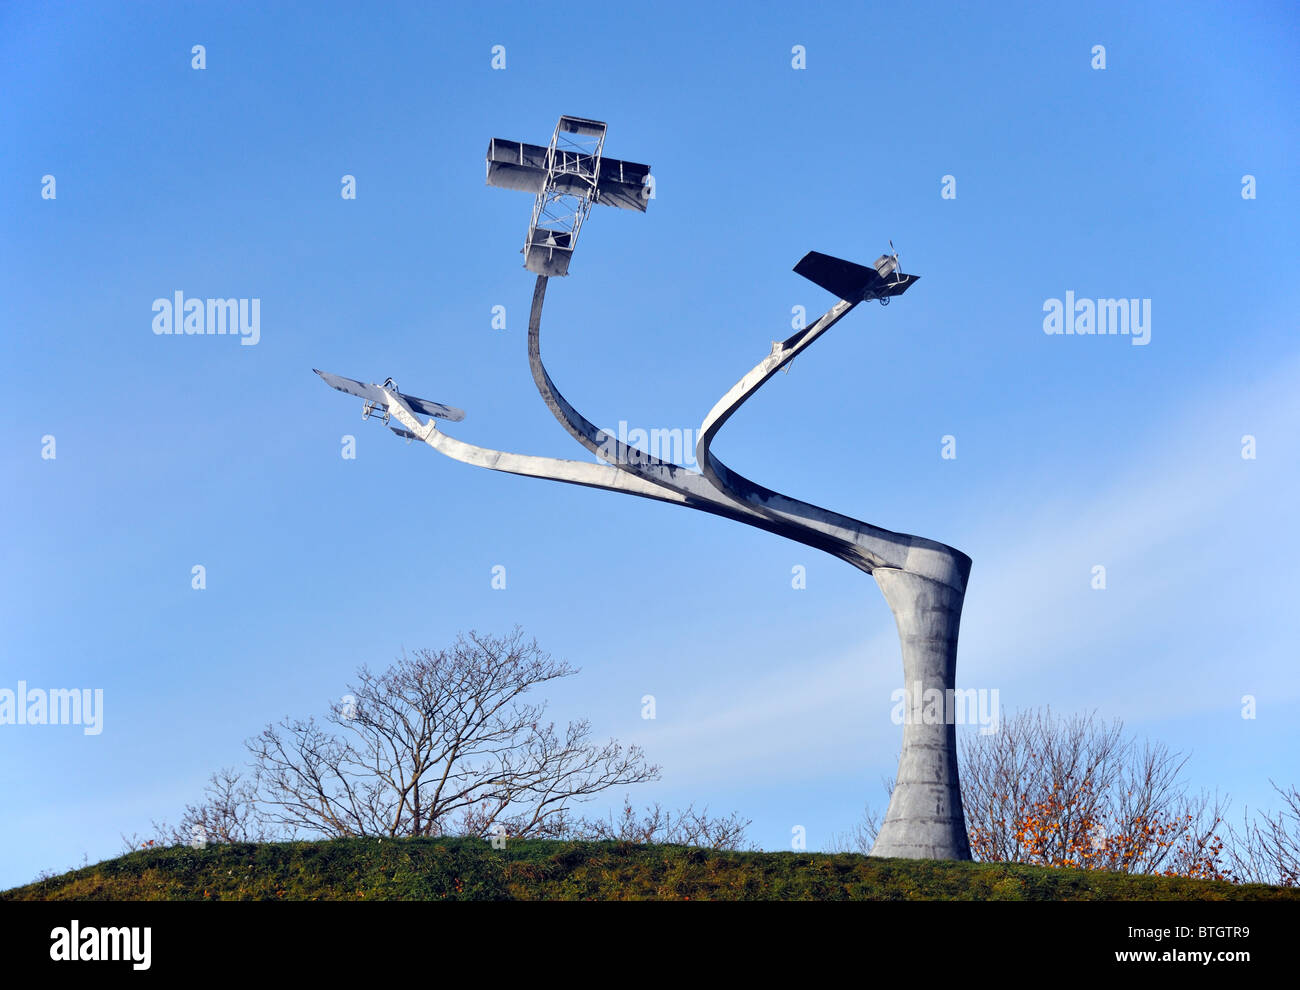 """Memorial l'esprit de vol'. Loch Lanark, Hyndford Street, Lanark, Lanarkshire, Écosse, Royaume-Uni, Europe. Banque D'Images"